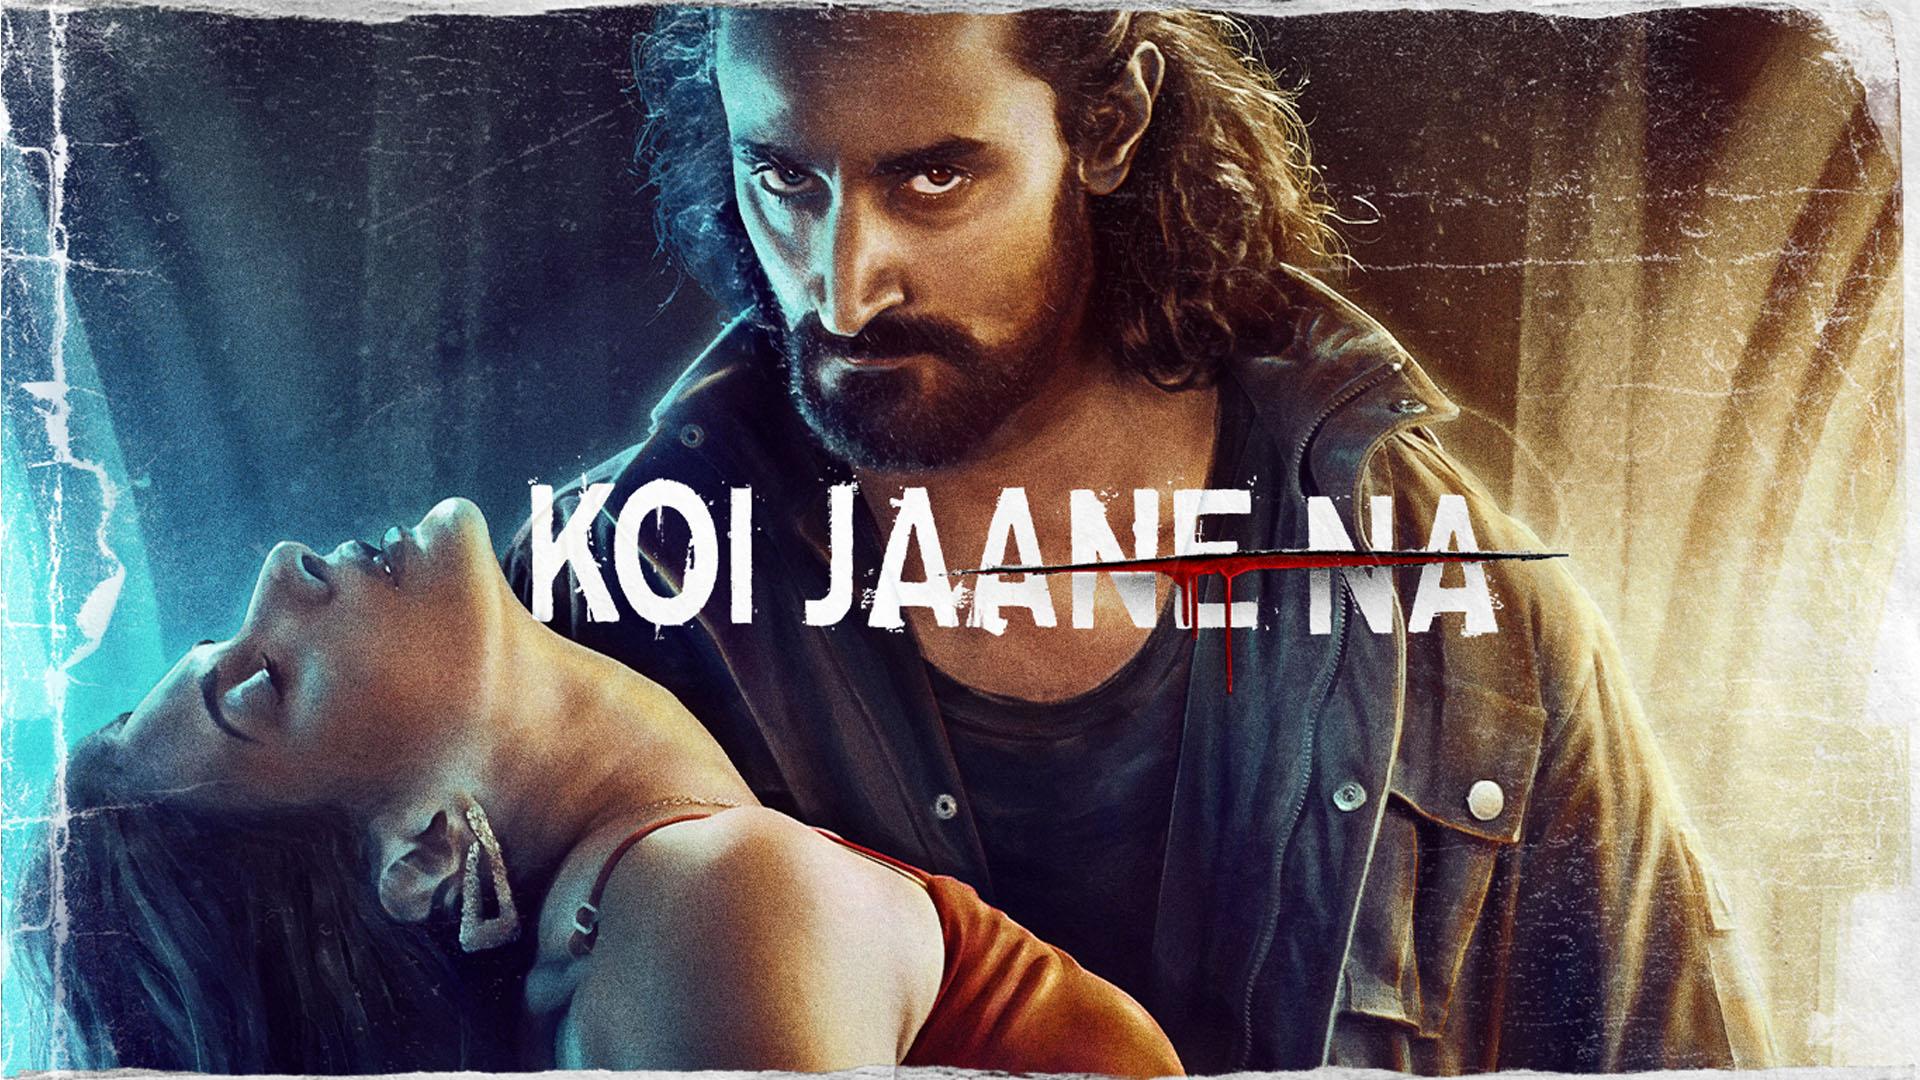 Koi Jaane Na